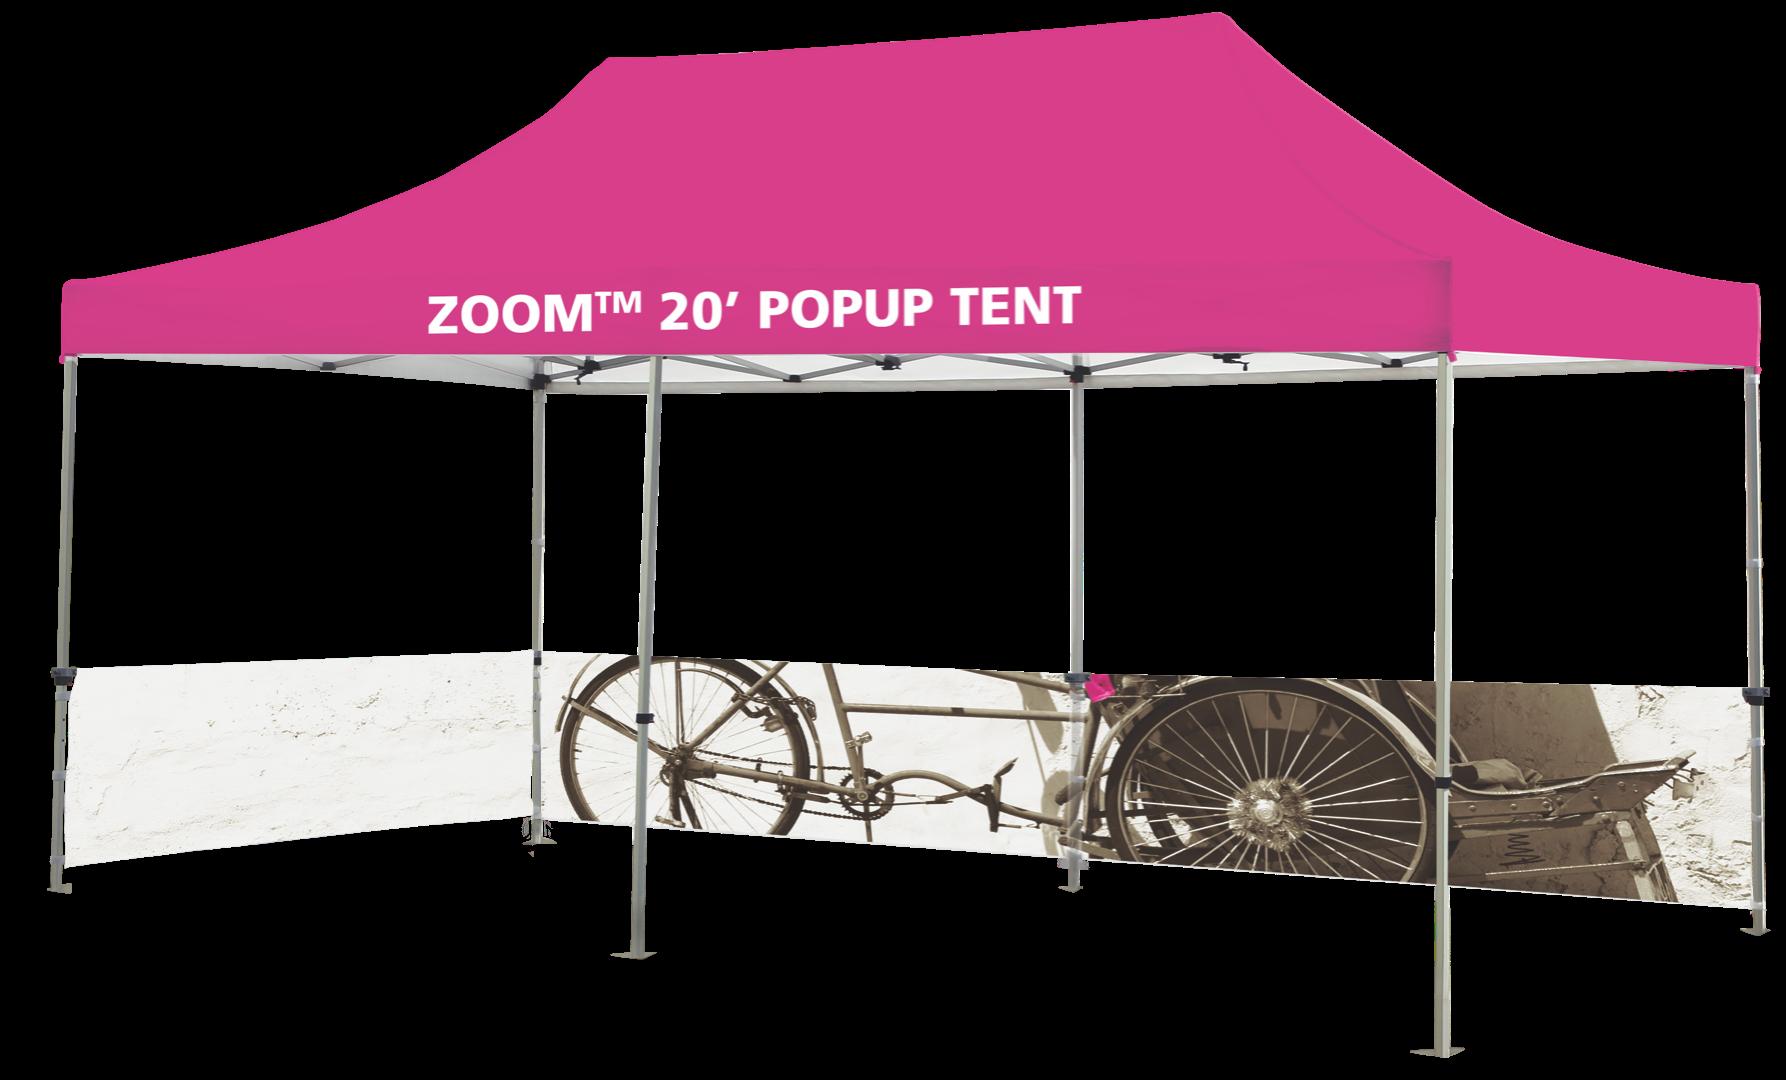 More Views  sc 1 st  Overnight Grafix & Custom Printed Zoom 20 Popup Tent Overnight Grafix